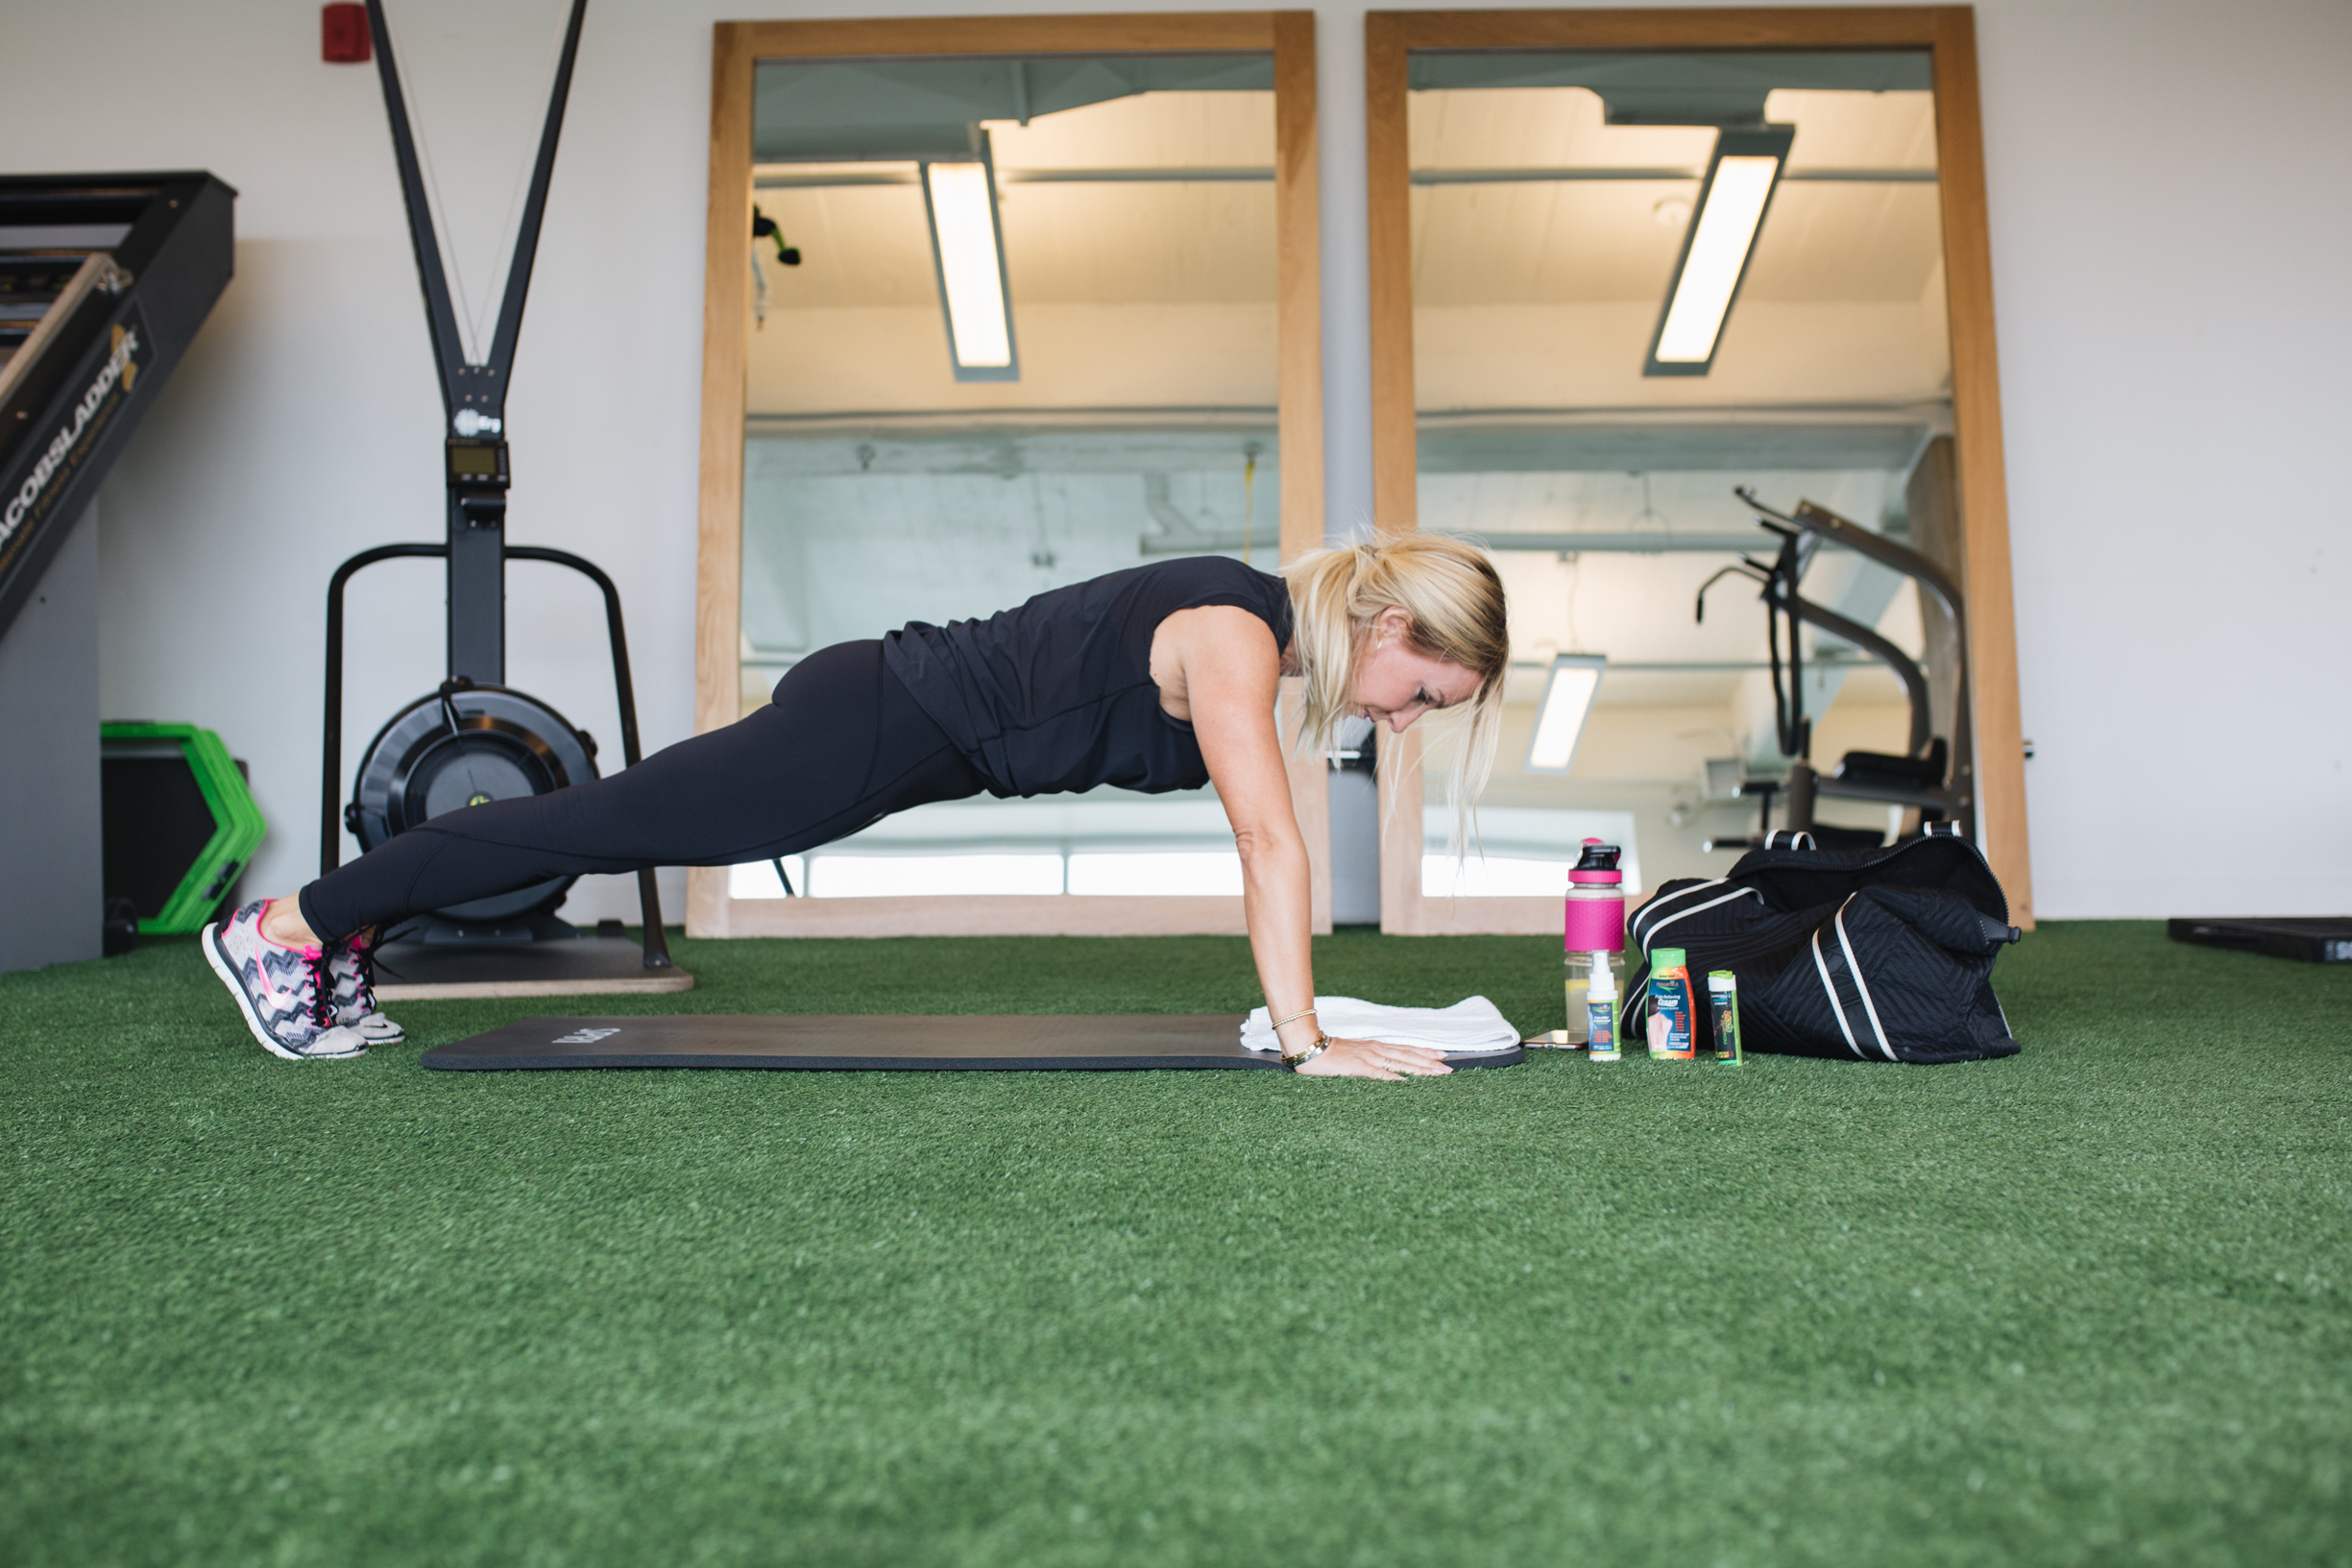 Novarnica natural pain killer arnica sport lifestyle blog mademoiselle jules at the gym